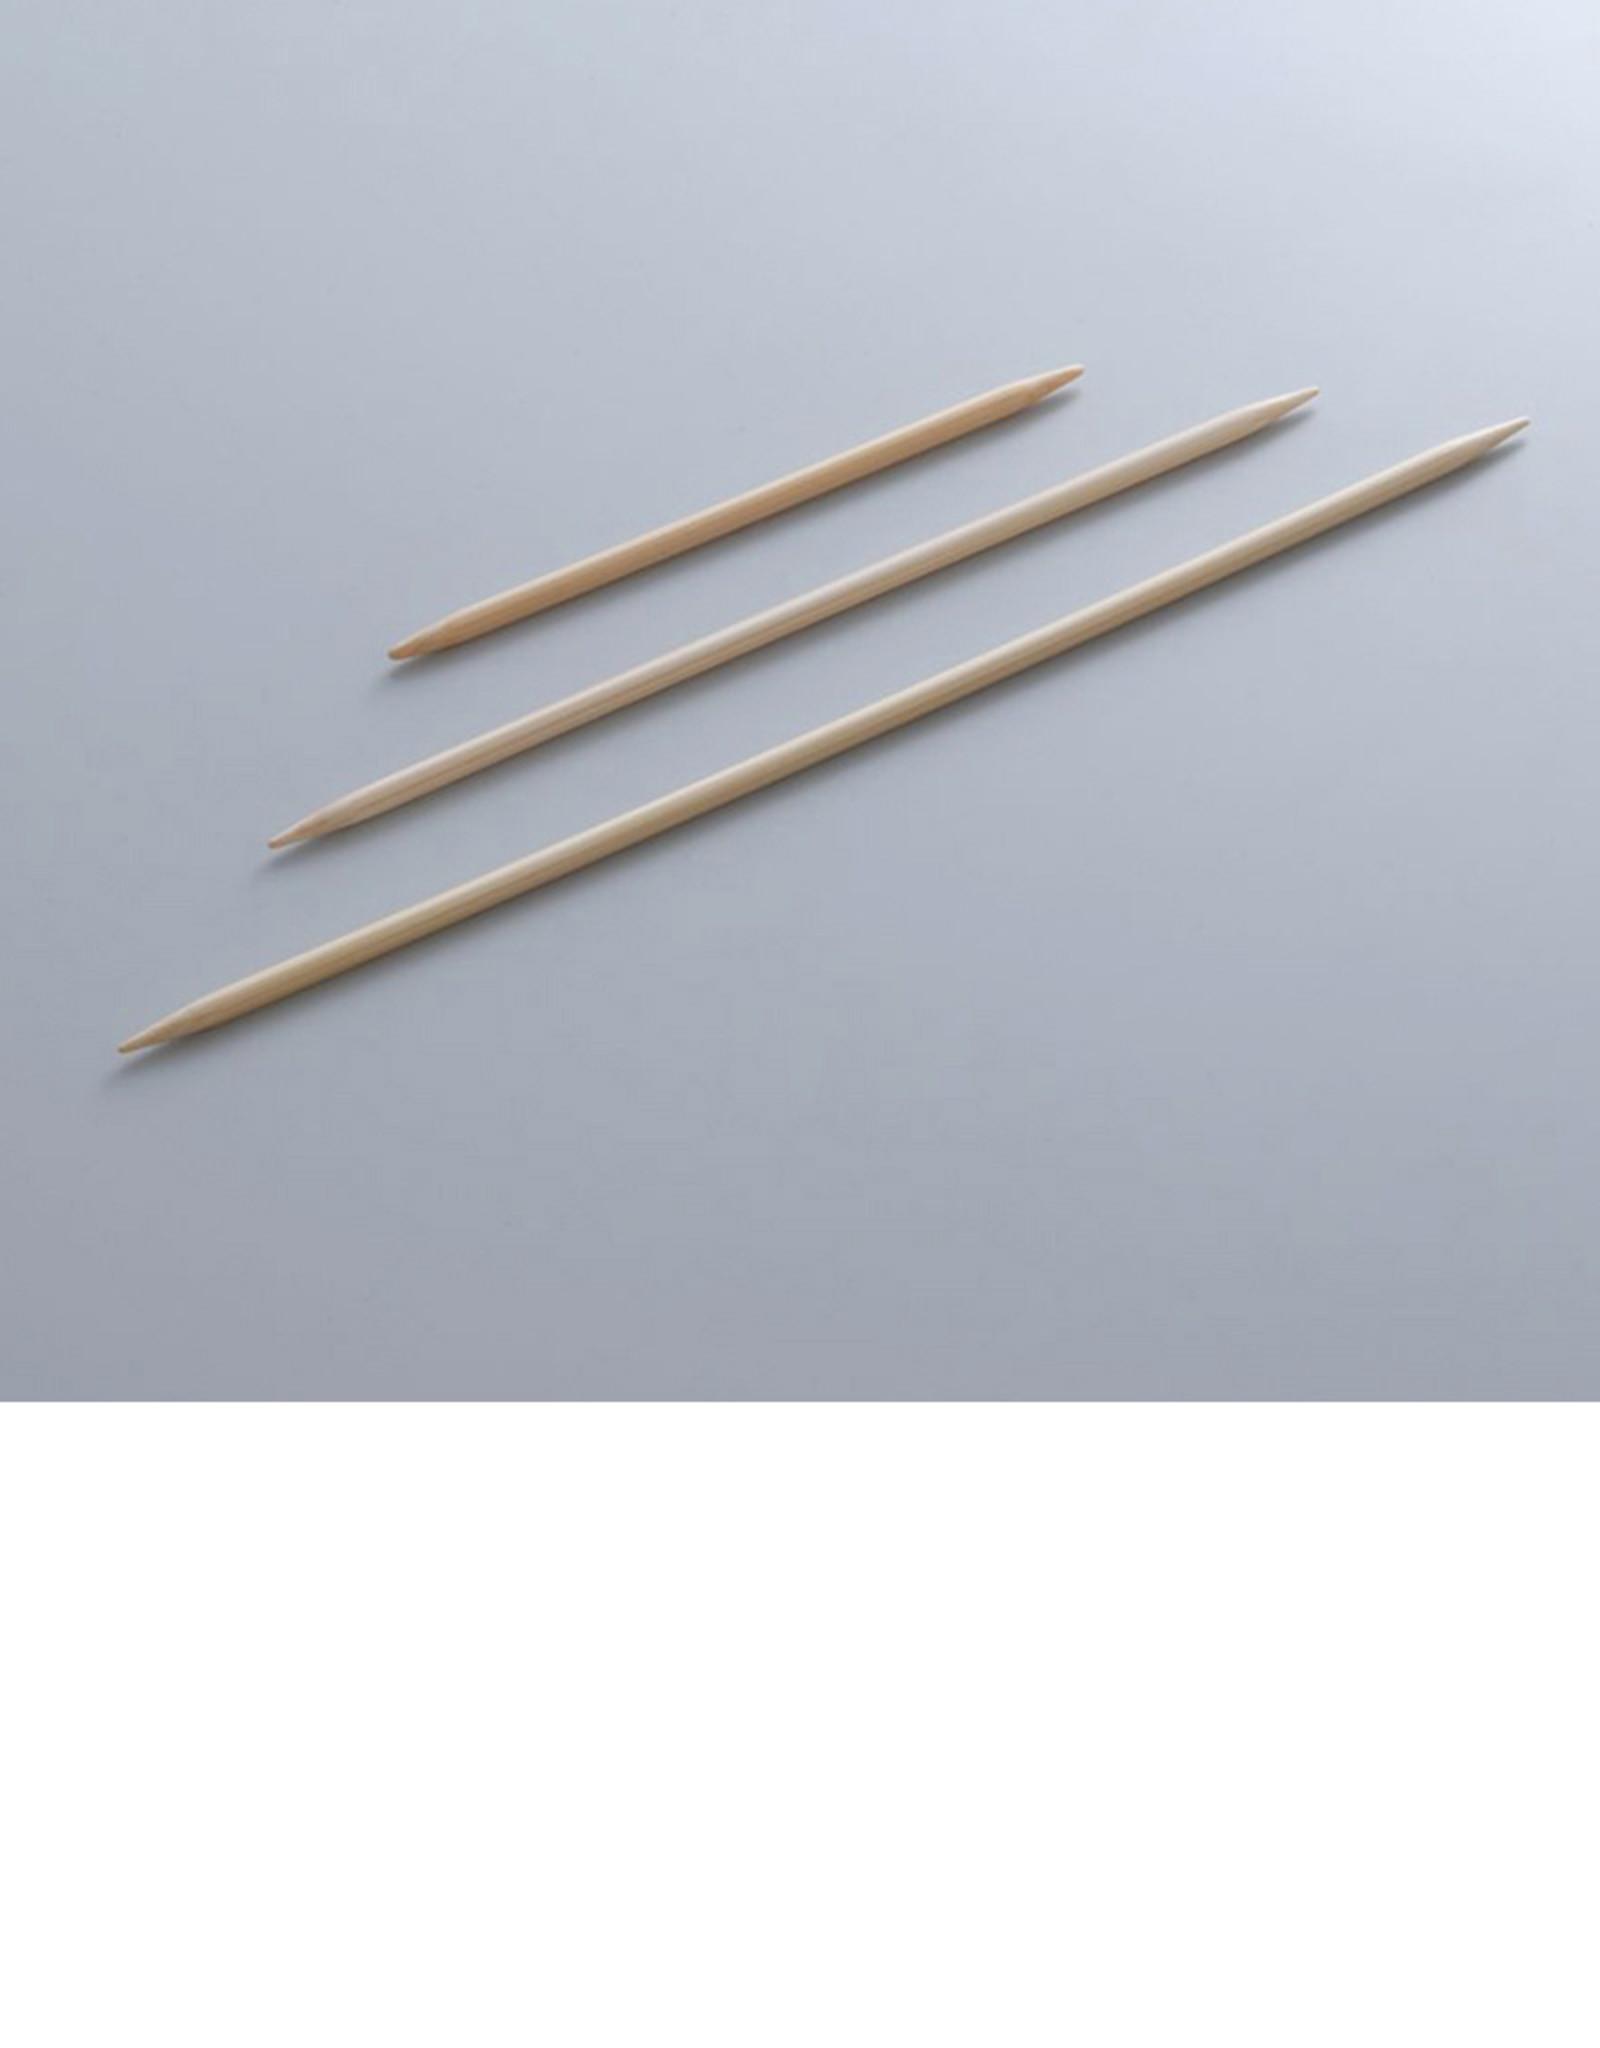 Kinki Amibari KA Double Point Needles US 2